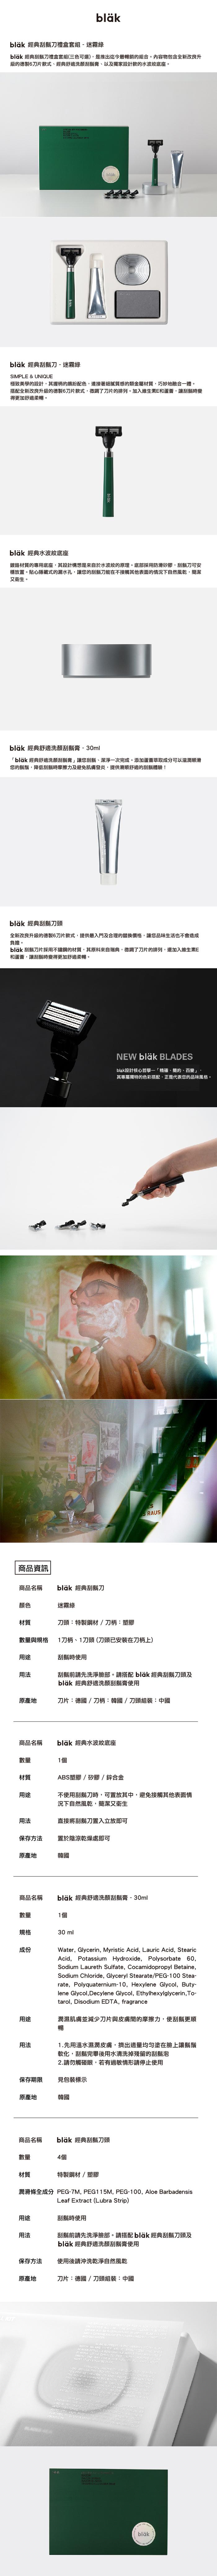 bläk|blak經典刮鬍刀禮盒套組(迷霧綠)